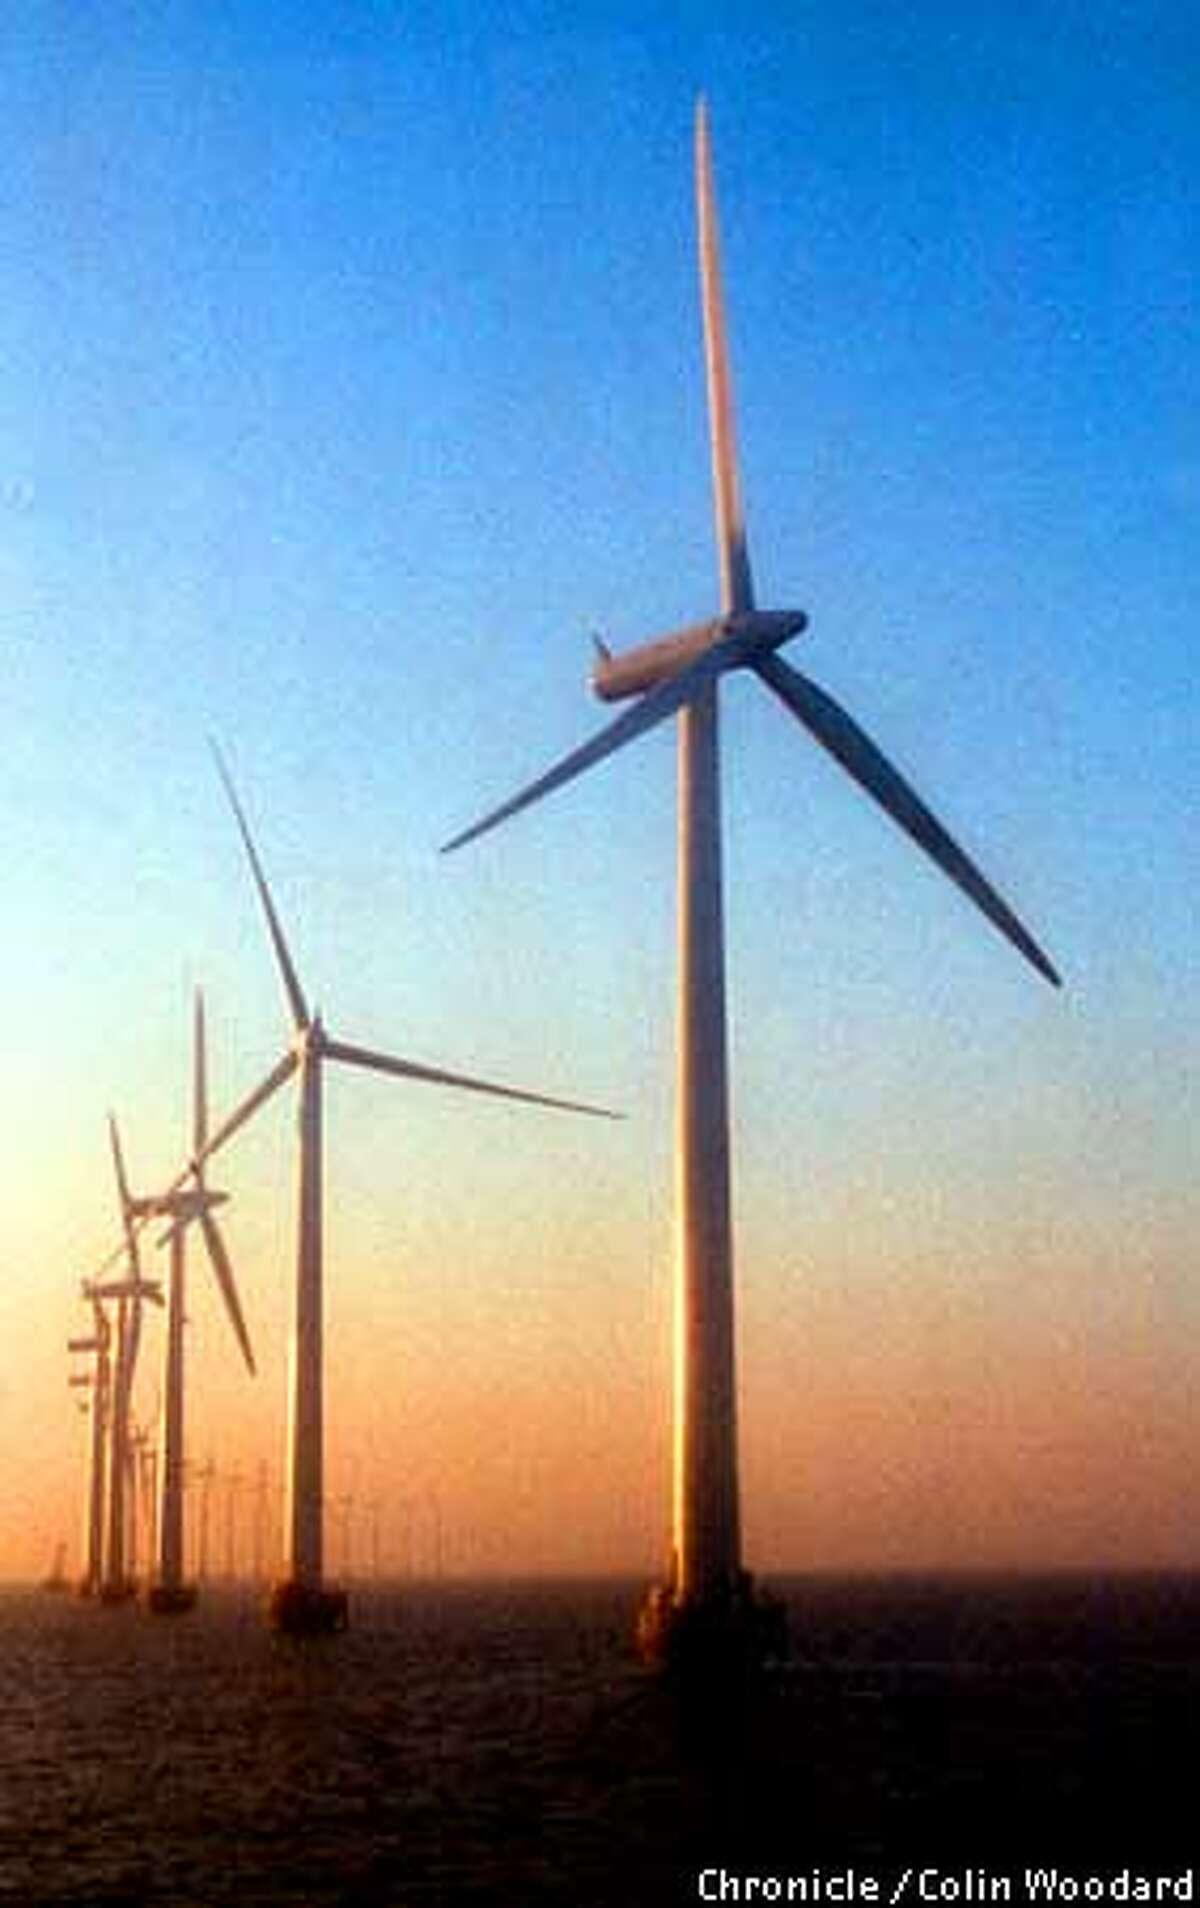 Middlegrunden offshore Wind Farm, Copenhagen, Denmark. Photo By Colin Woodard/for the Chronicle